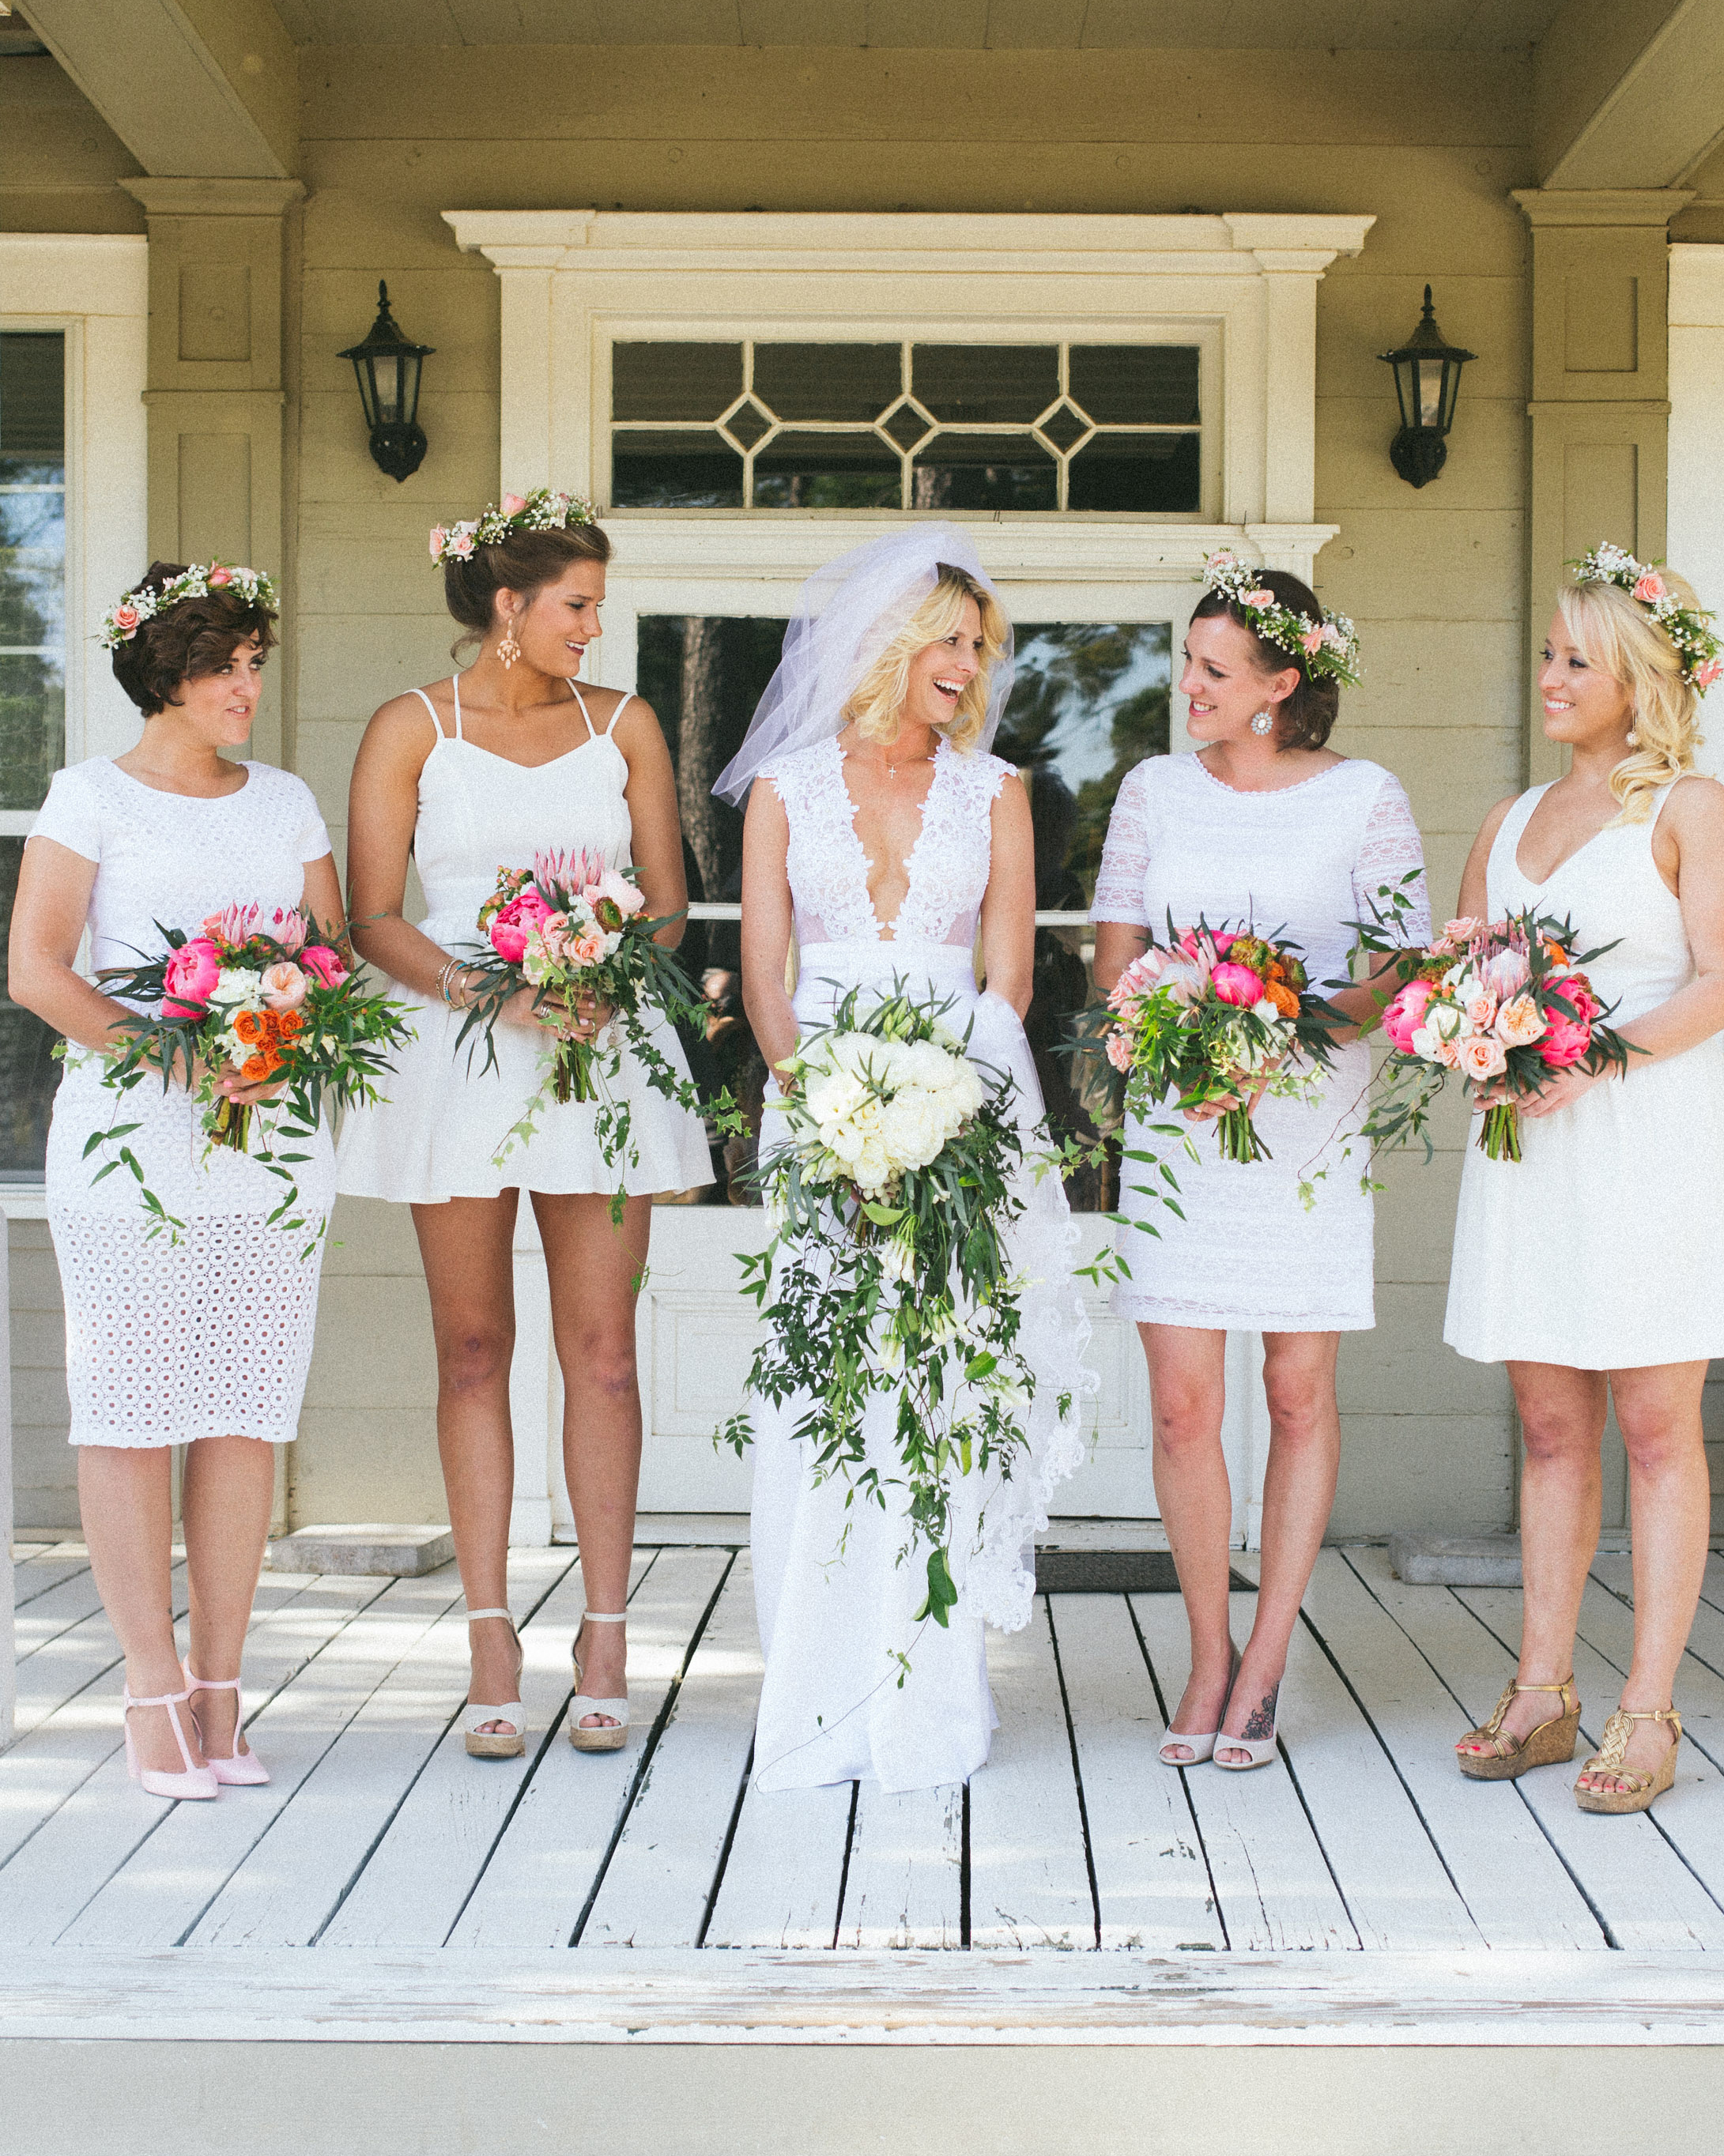 leah-michael-wedding-bridesmaids-0317-s111861-0515.jpg